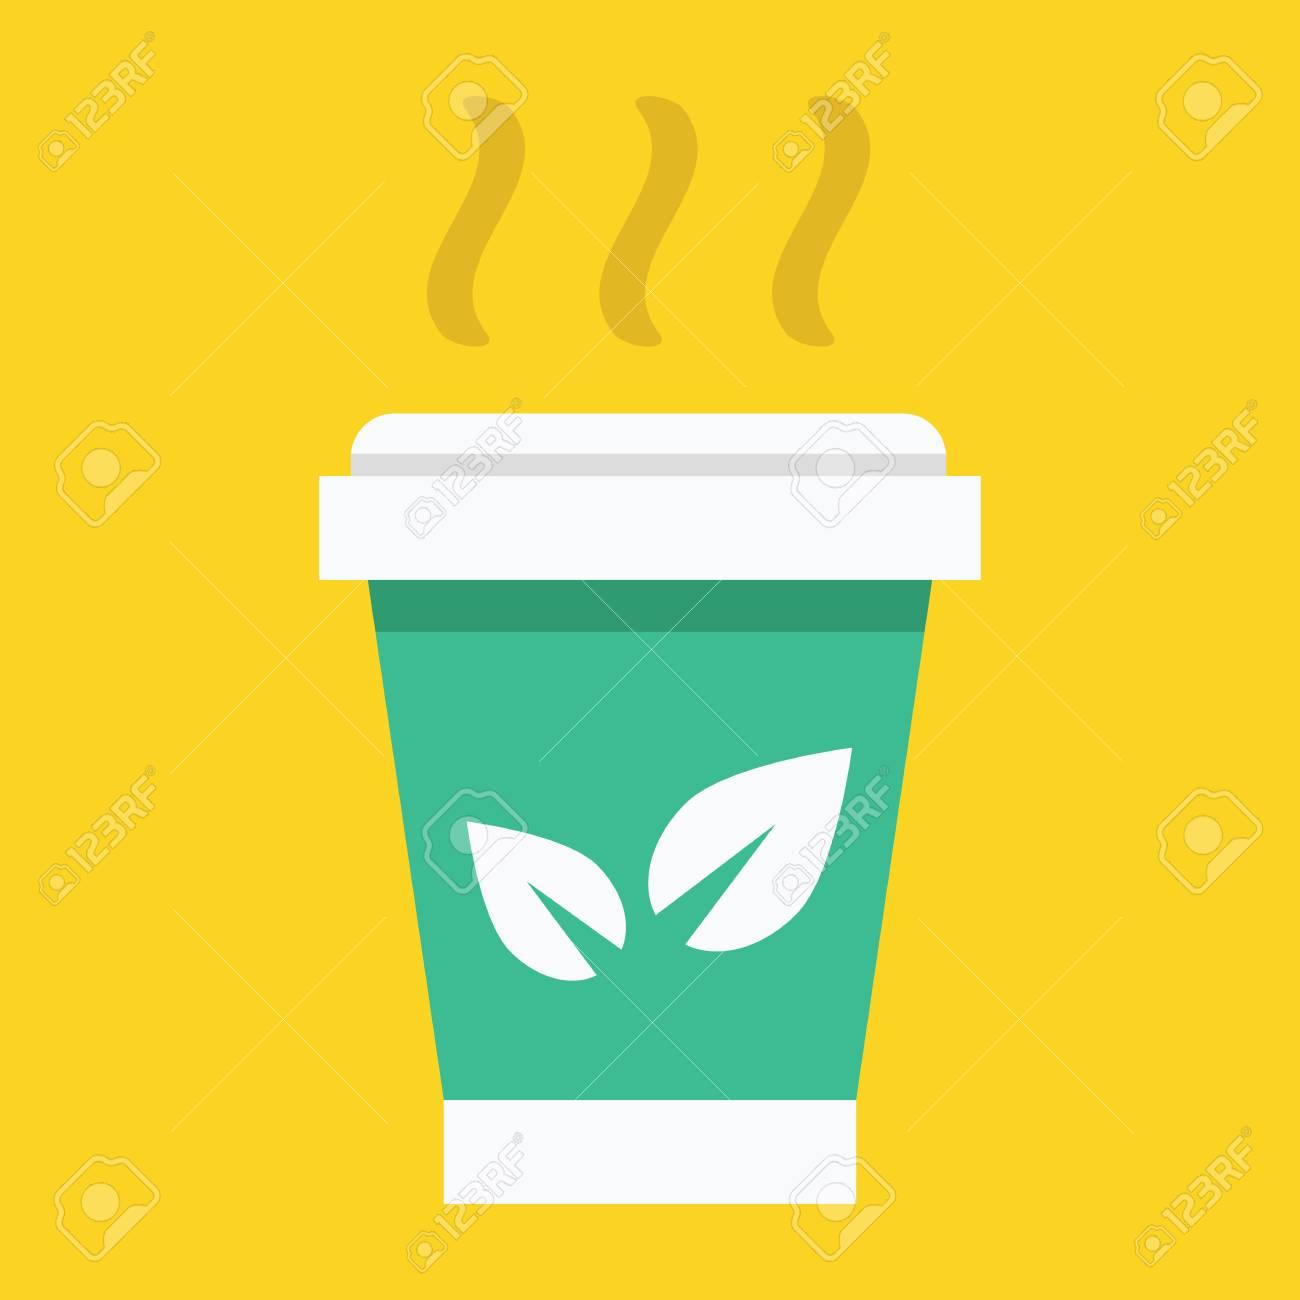 Paper Tea Cup Icon Stock Vector - 26454841